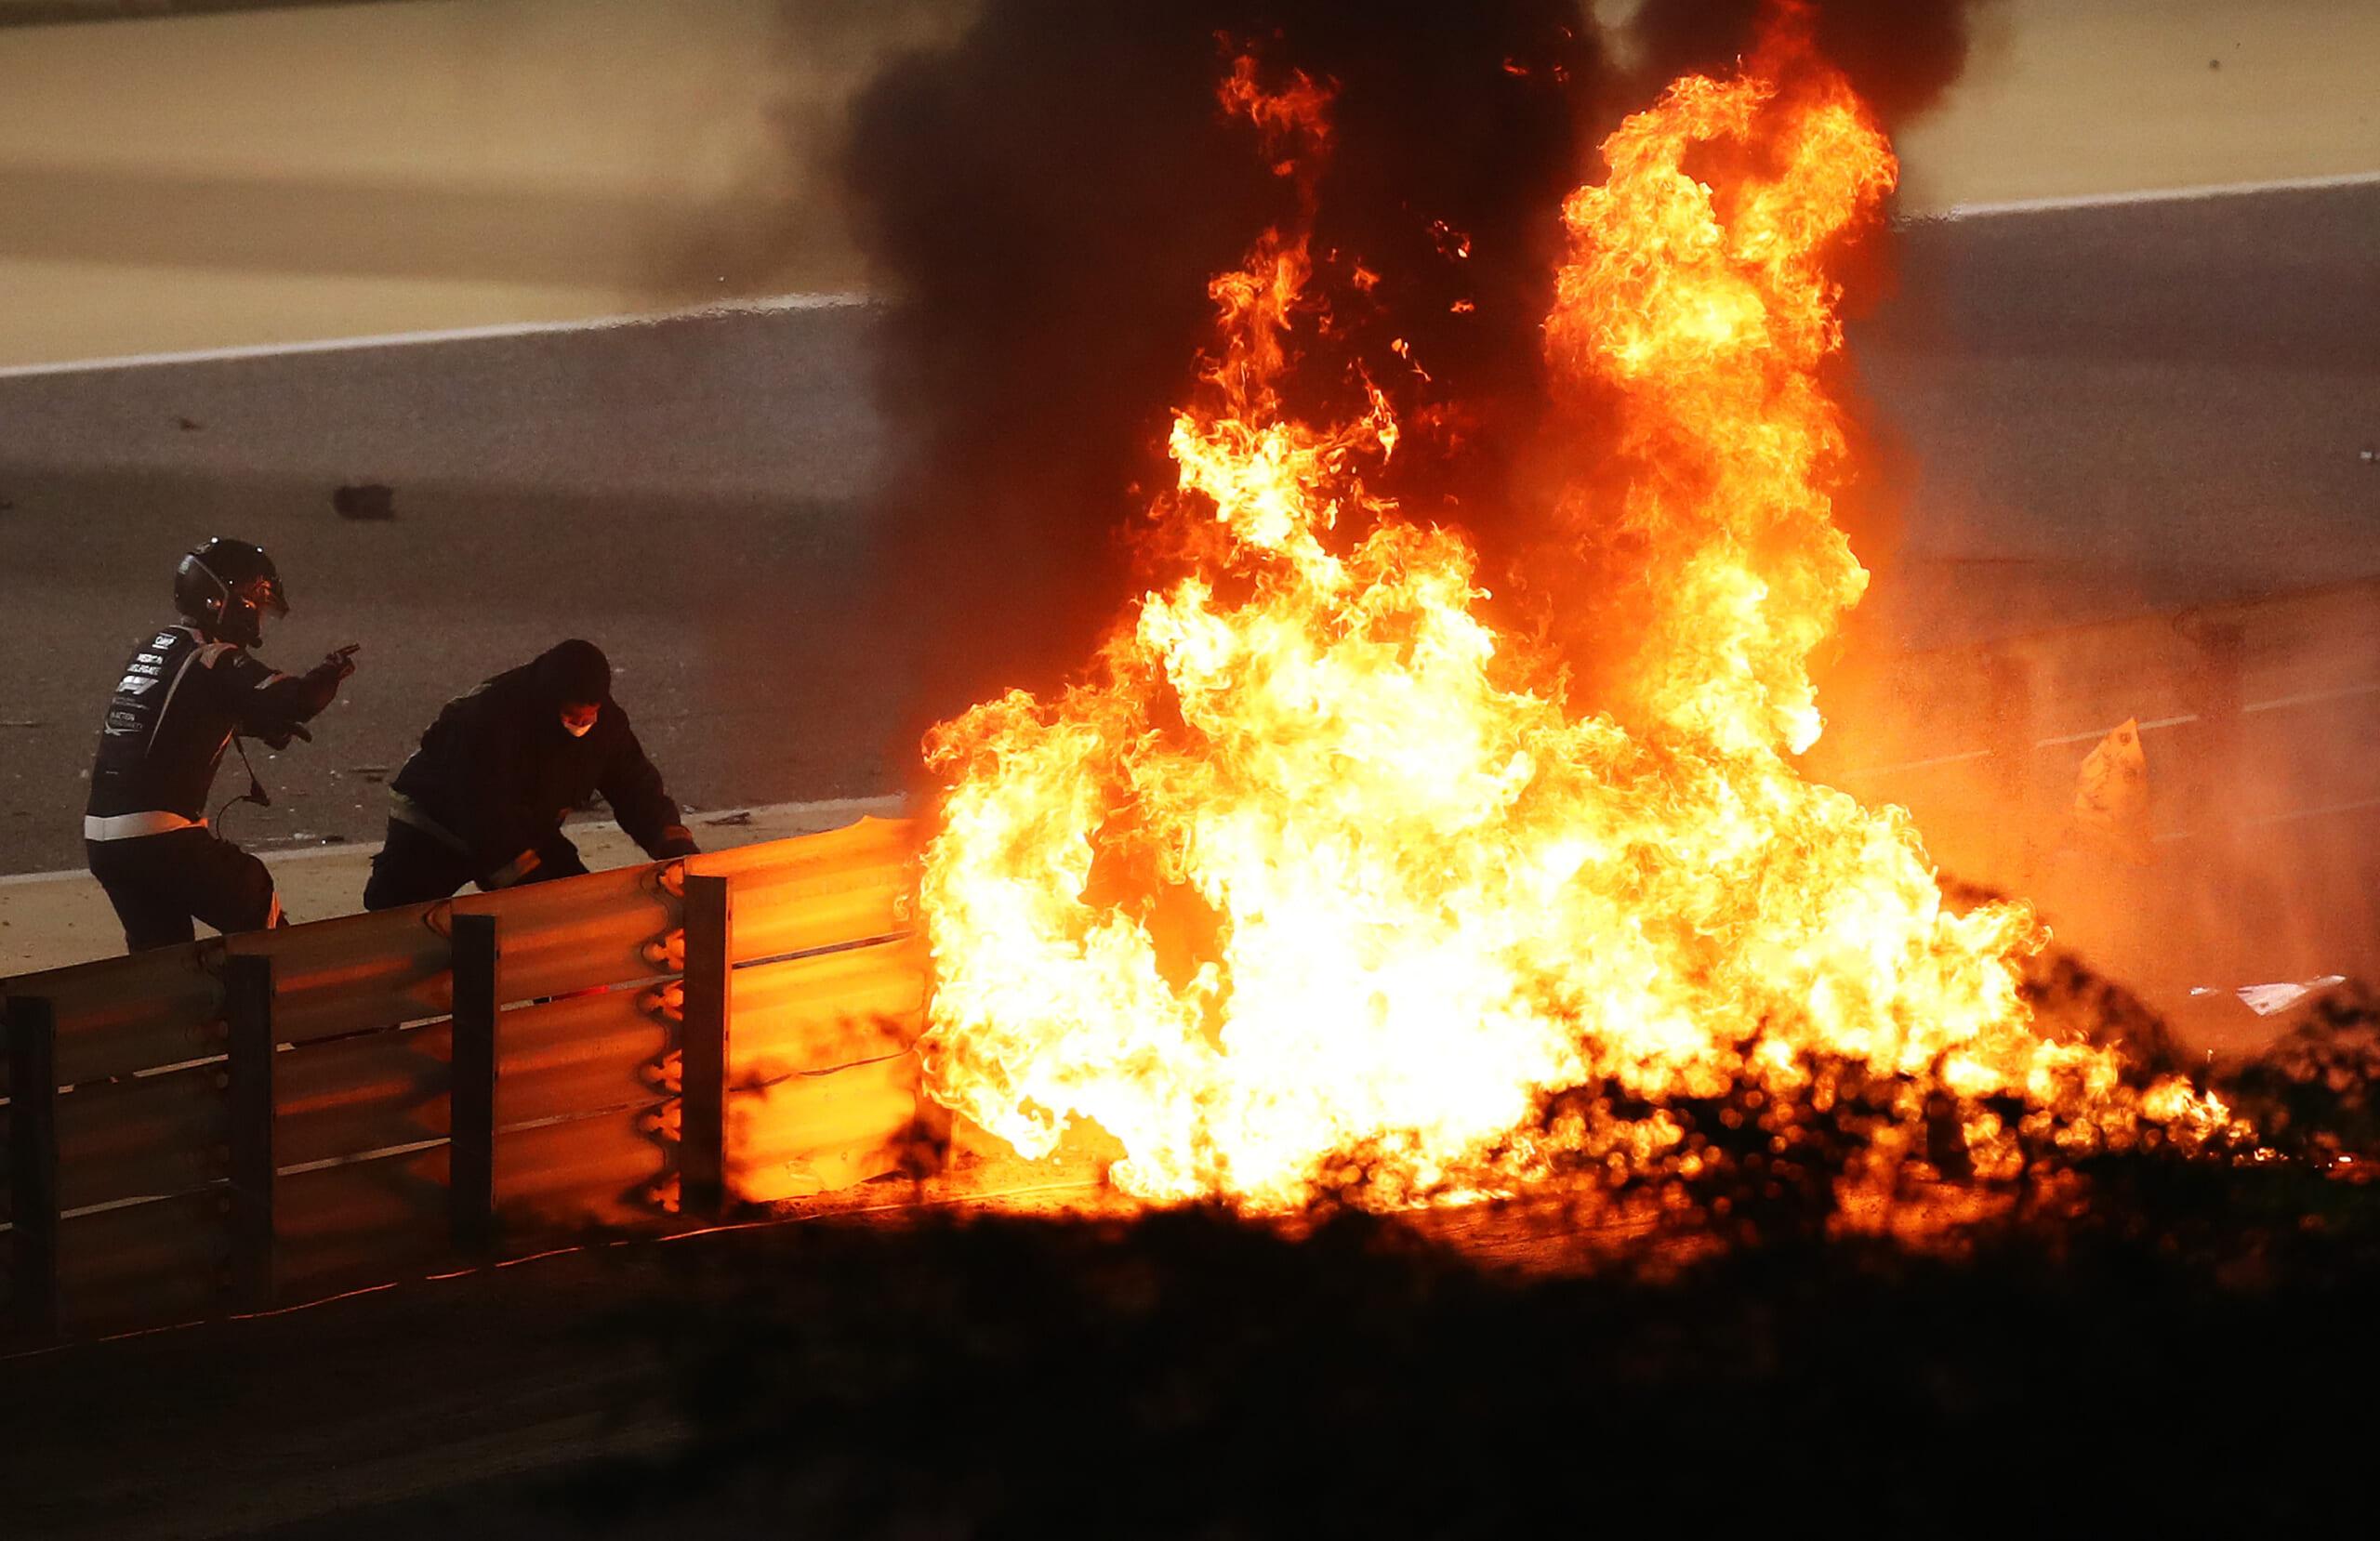 Fiery crash of Romain Grosjean of France and Haas F1 during the F1 Grand Prix of Bahrain on November 29, 2020 in Bahrain, Bahrain.